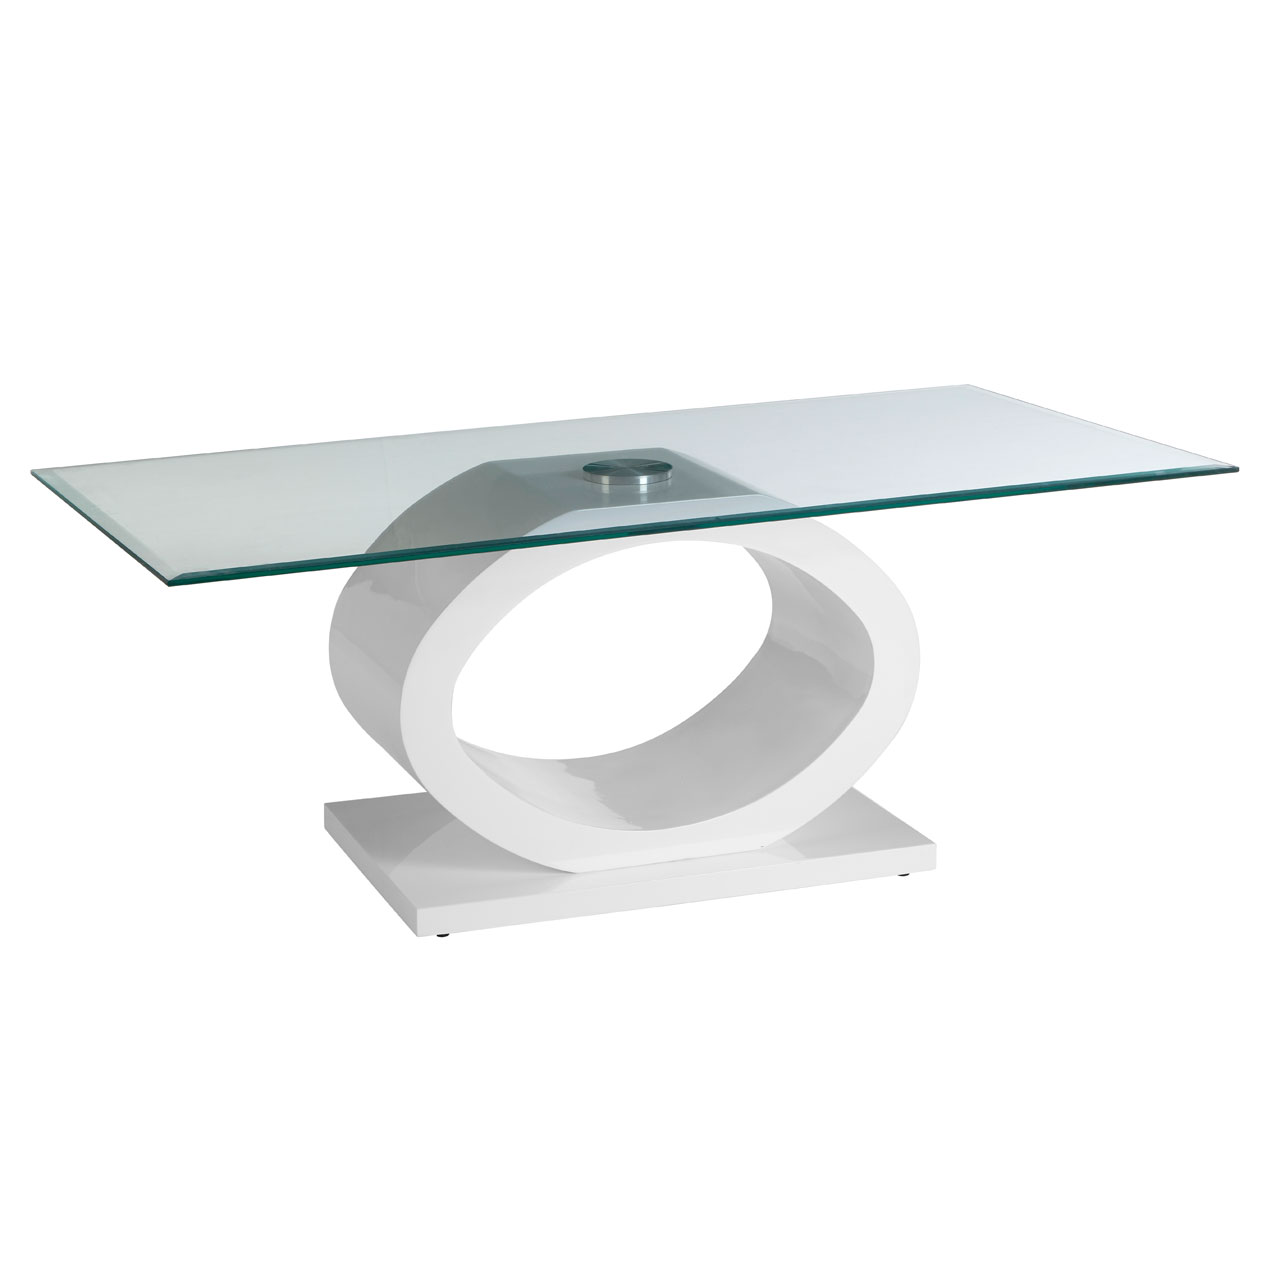 Halo White High Gloss Coffee Table: Halo White High Gloss & Glass Coffee Table